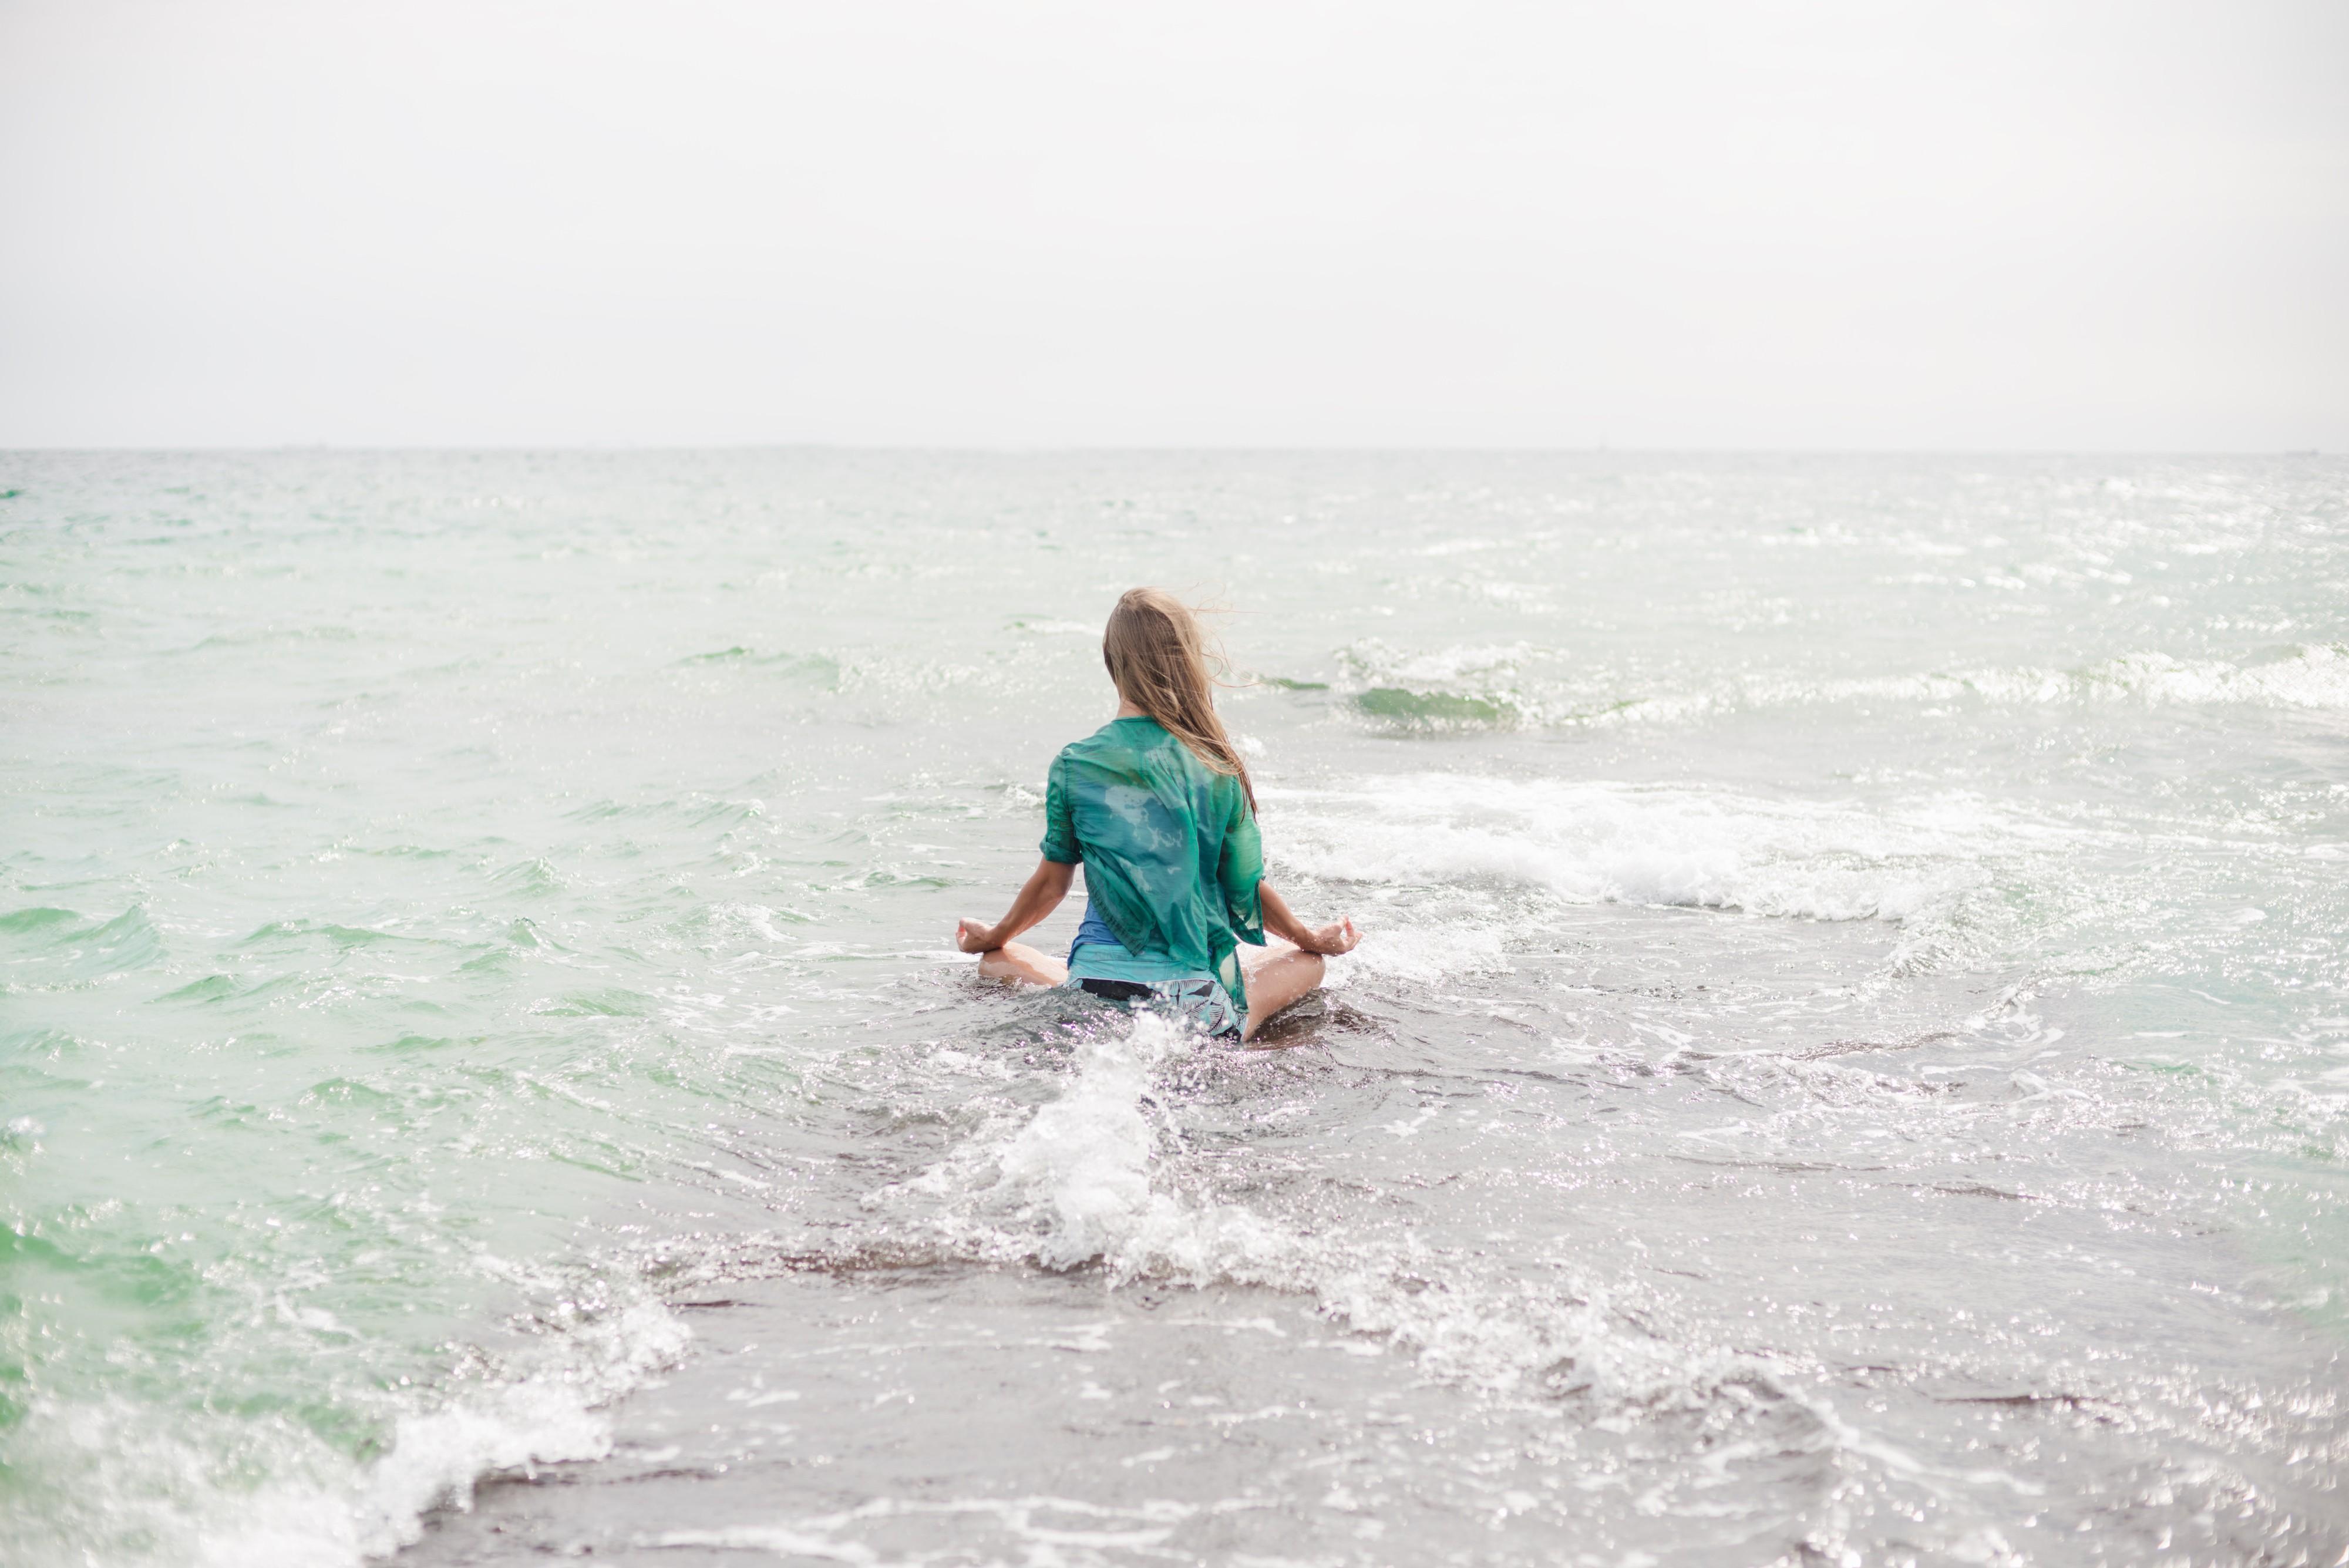 Wallpaper Women Sea Water Shore Sand Beach Yoga Meditation Vacation Ocean Surfboard Wind Wave Surfing Equipment And Supplies Skimboarding 4000x2670 Wallpapermaniac 154543 Hd Wallpapers Wallhere